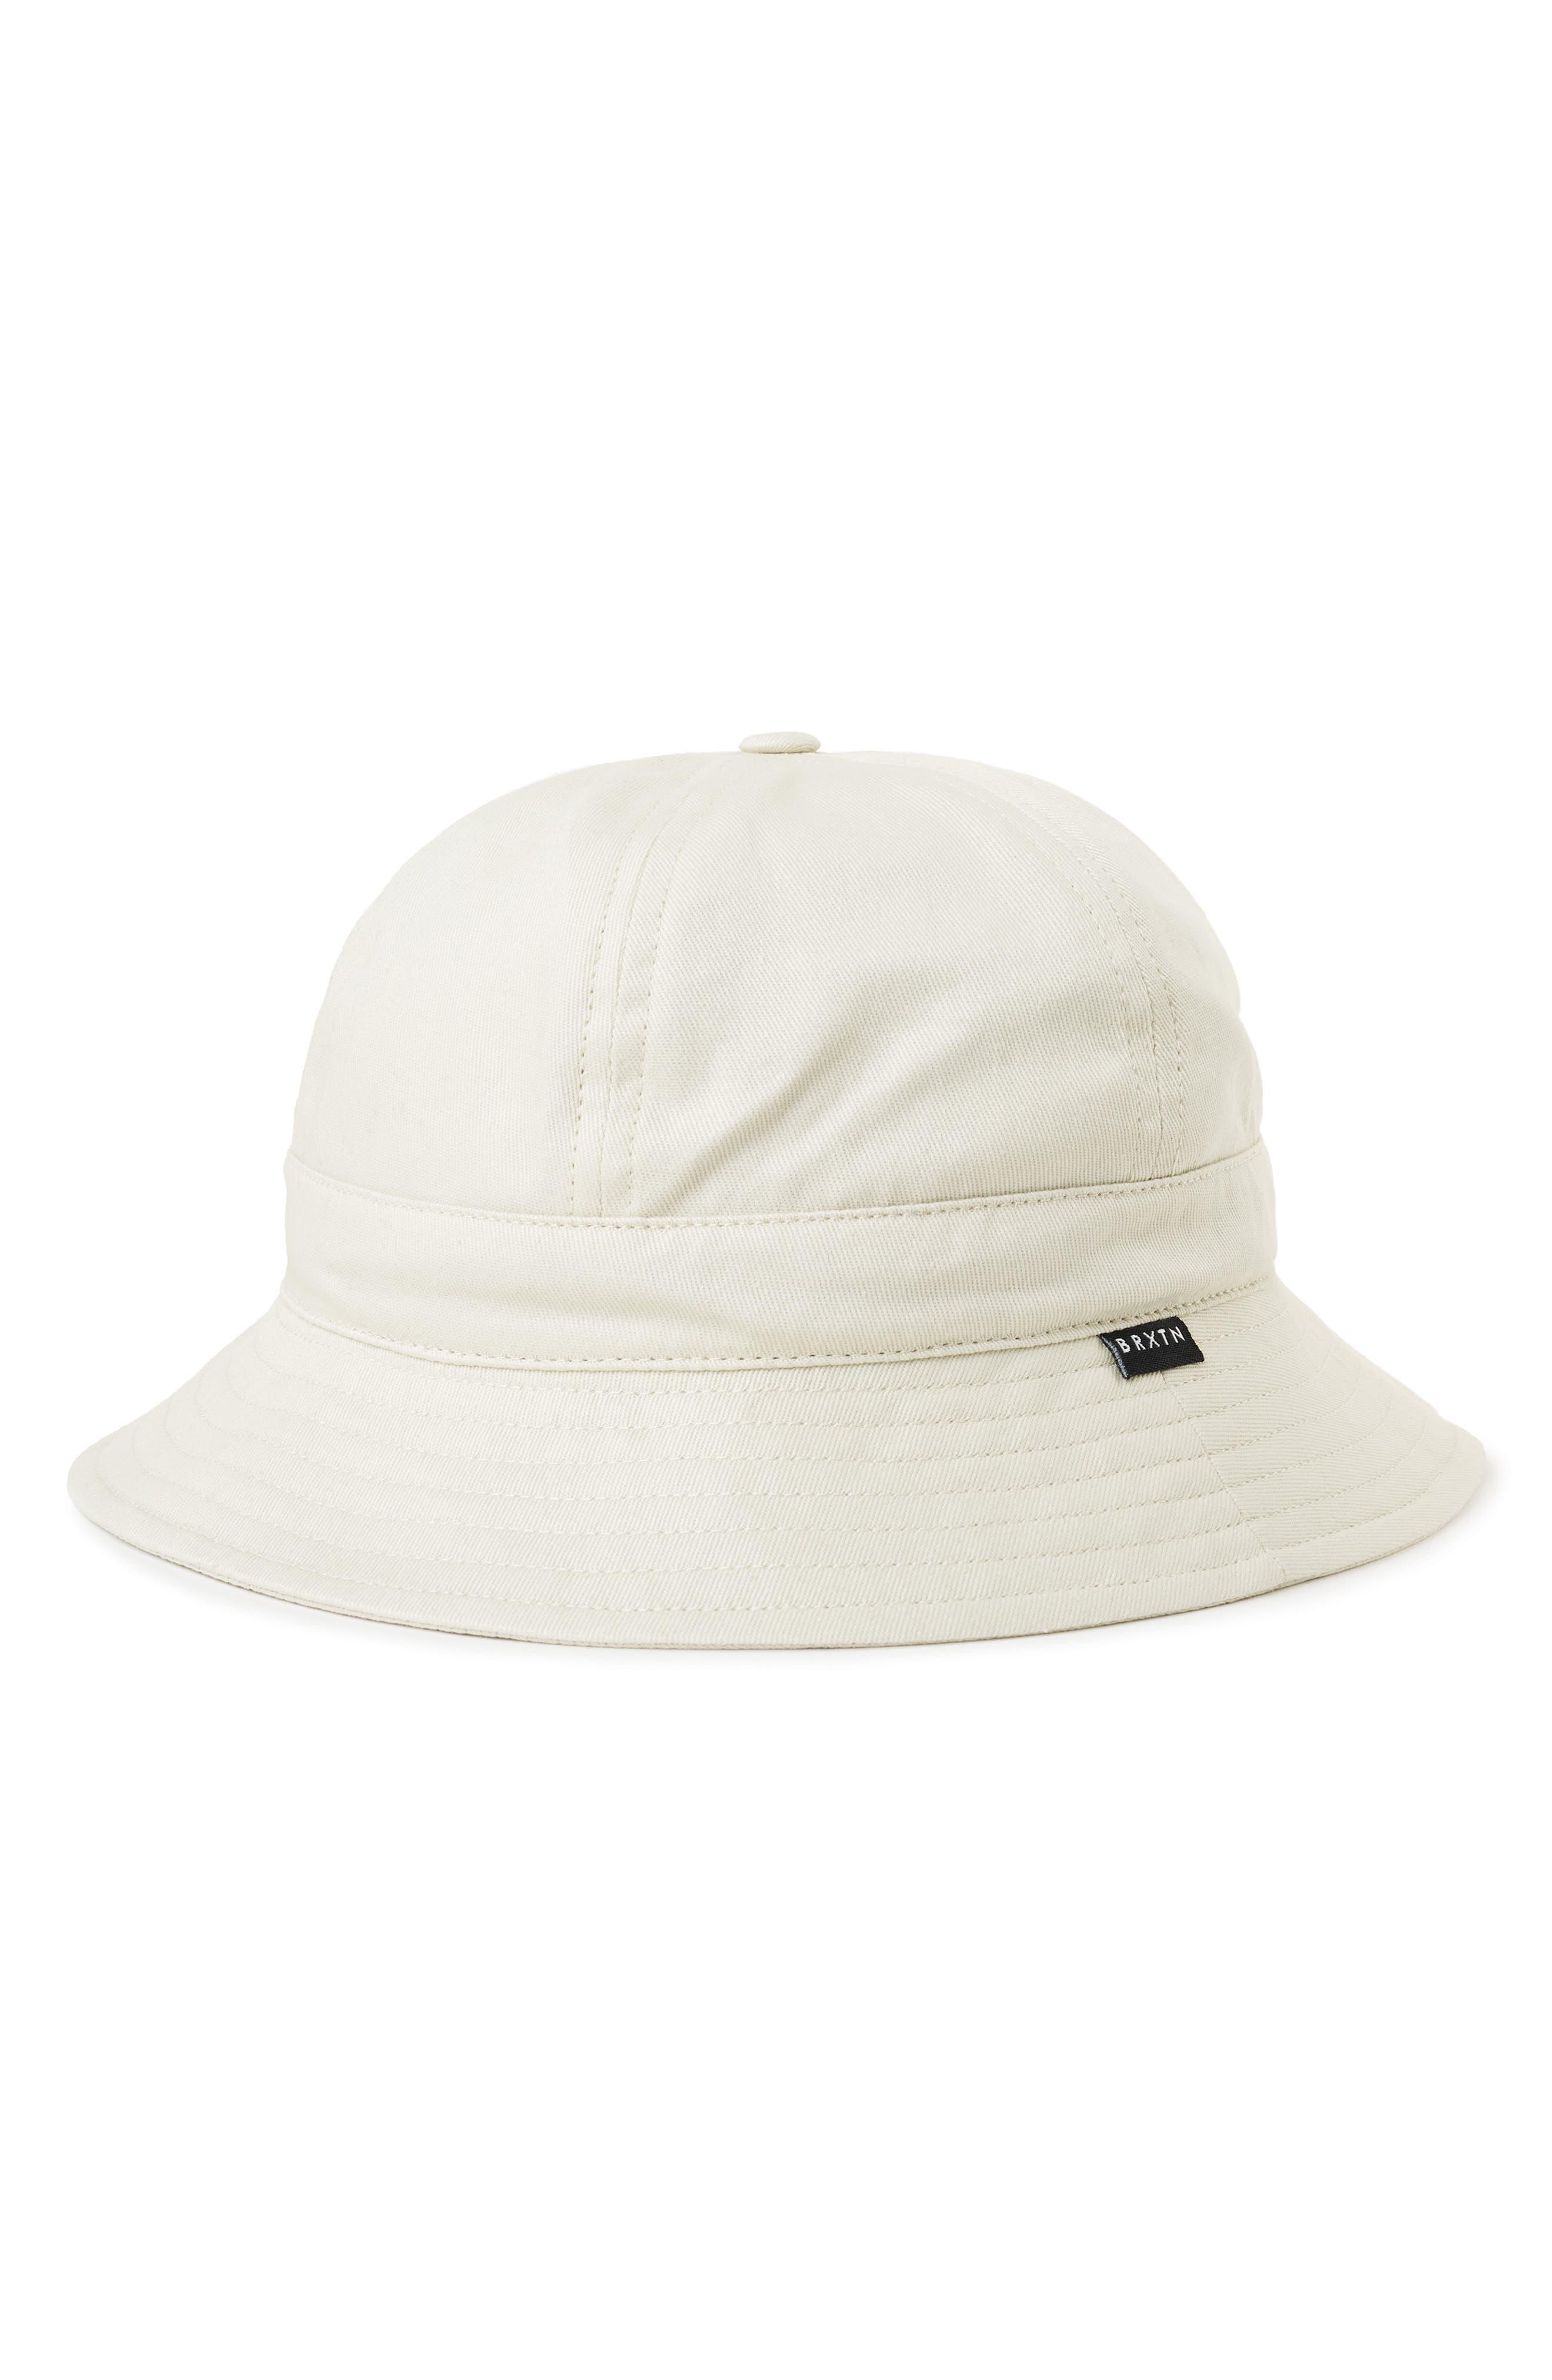 Banks II Bucket Hat,                             Main thumbnail 1, color,                             OFF WHITE